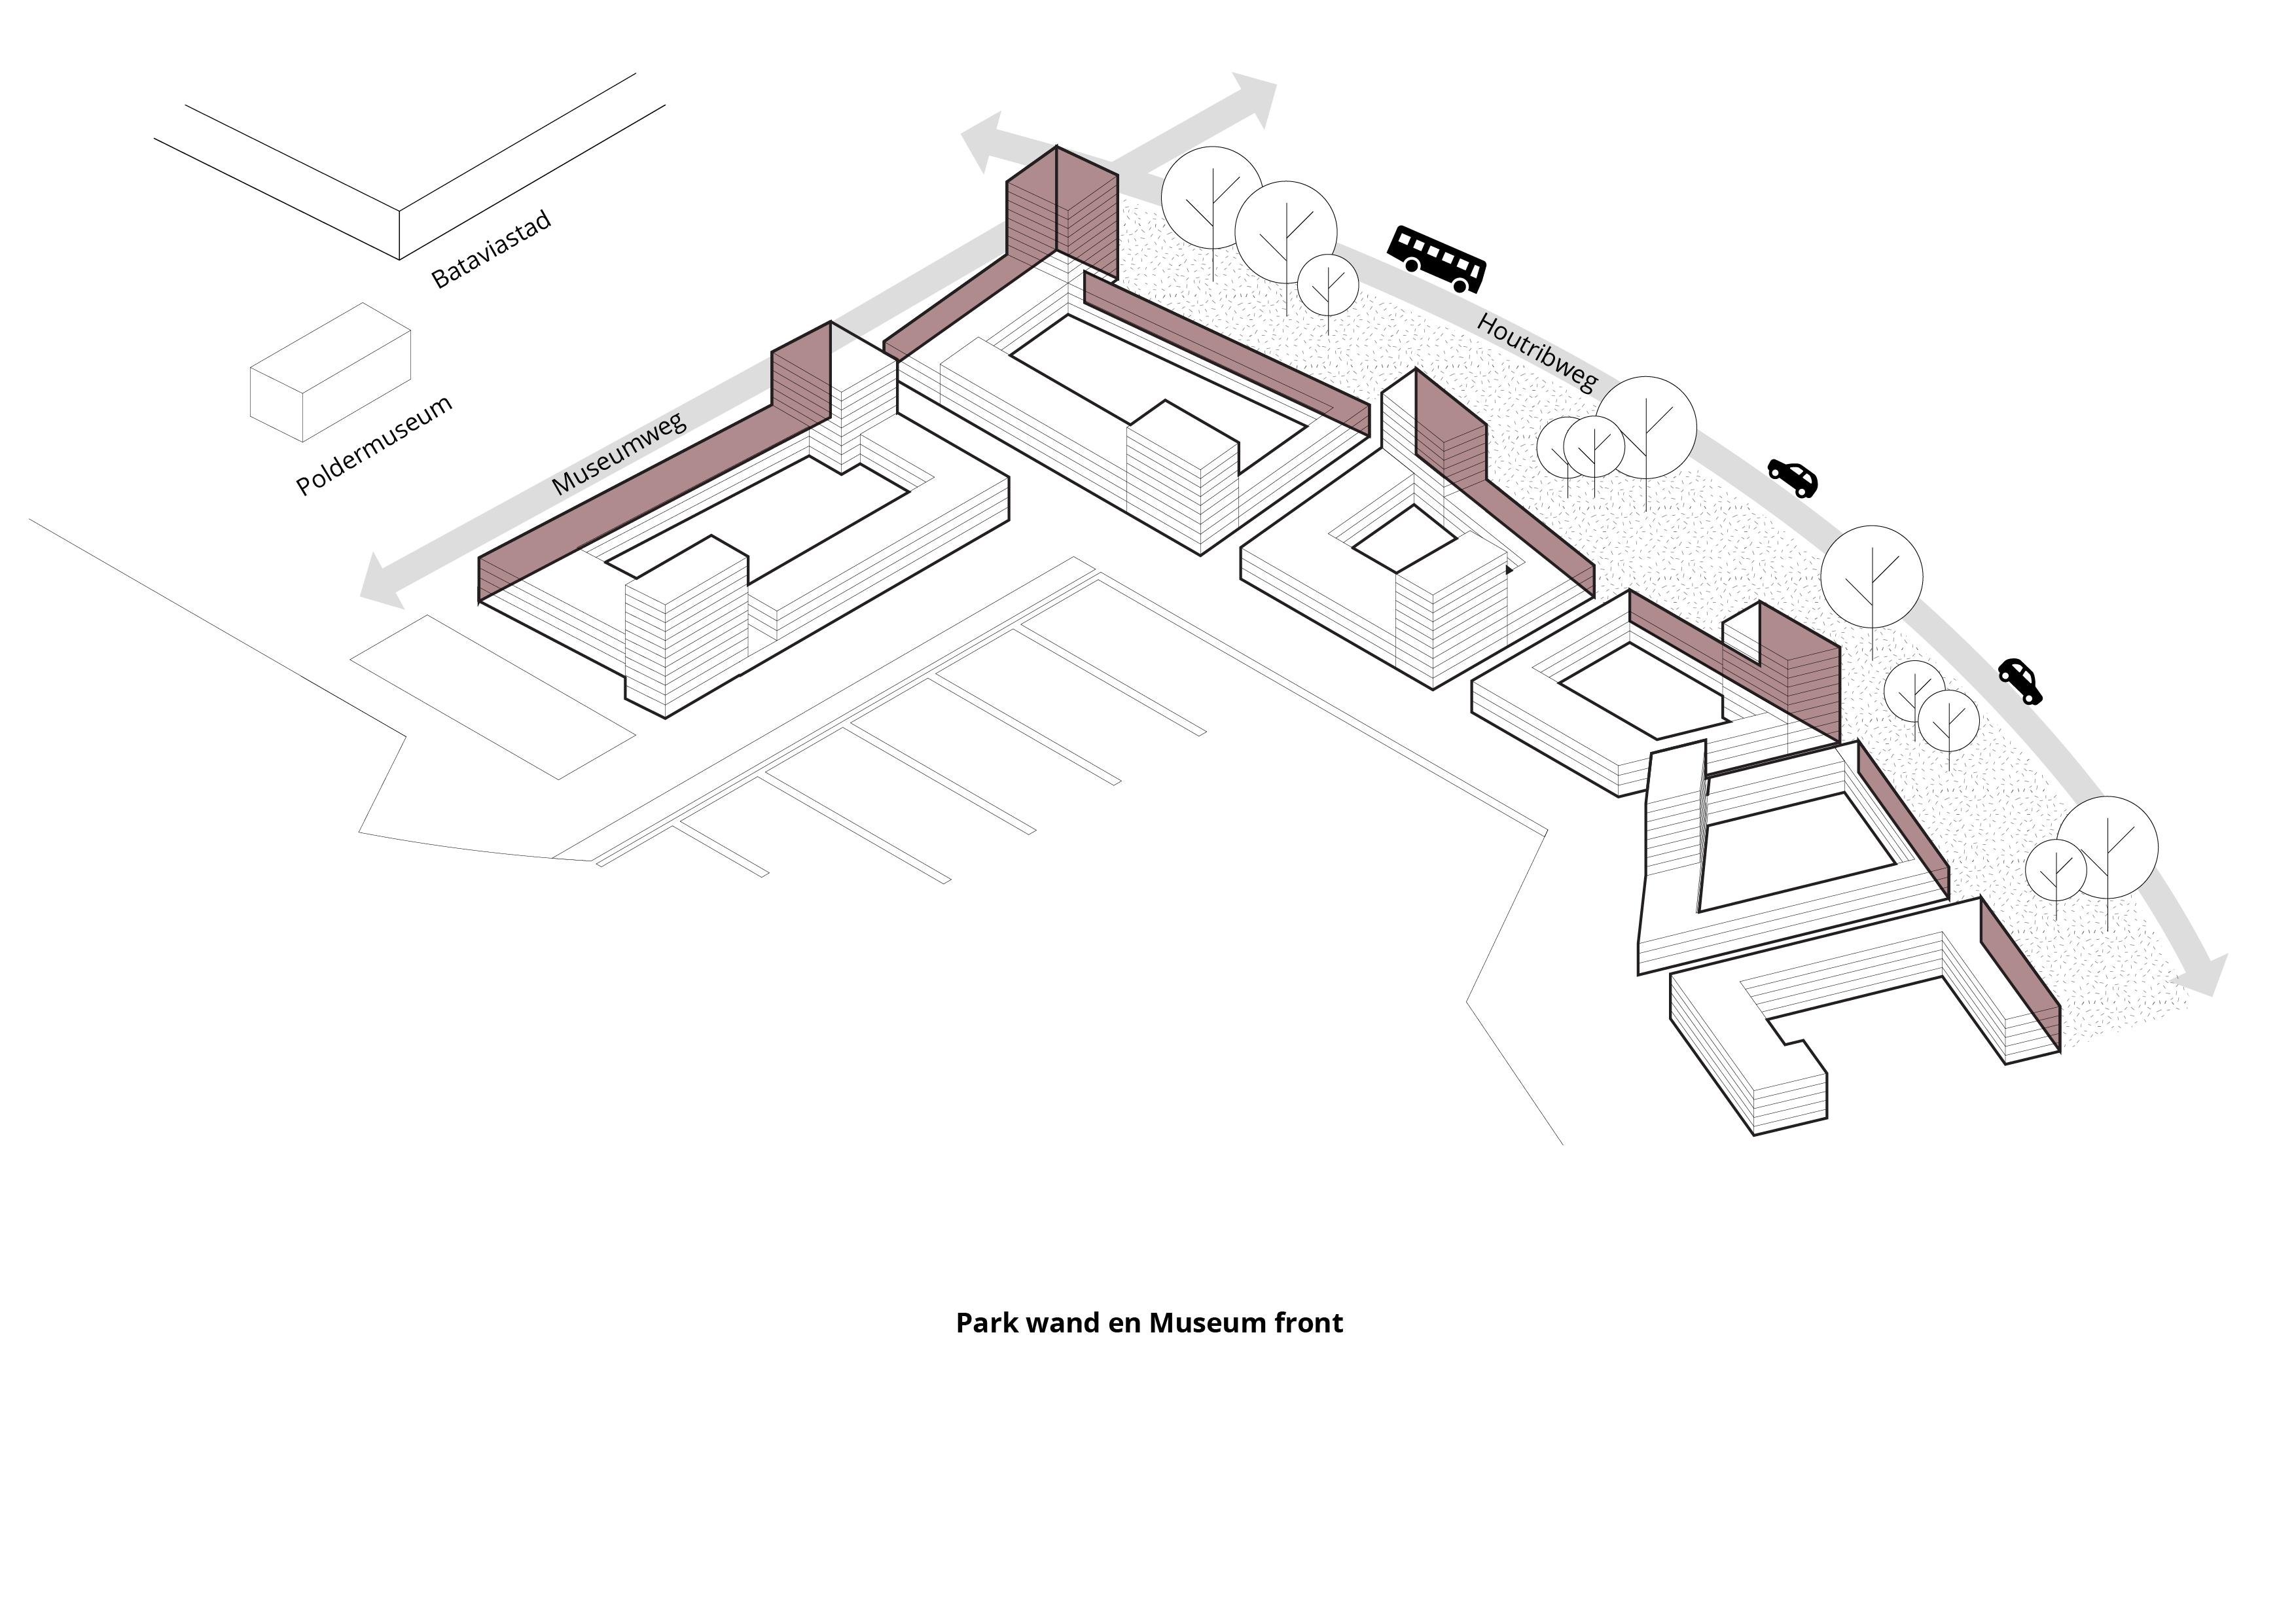 Havenkwartier Lelystad – Parkwand